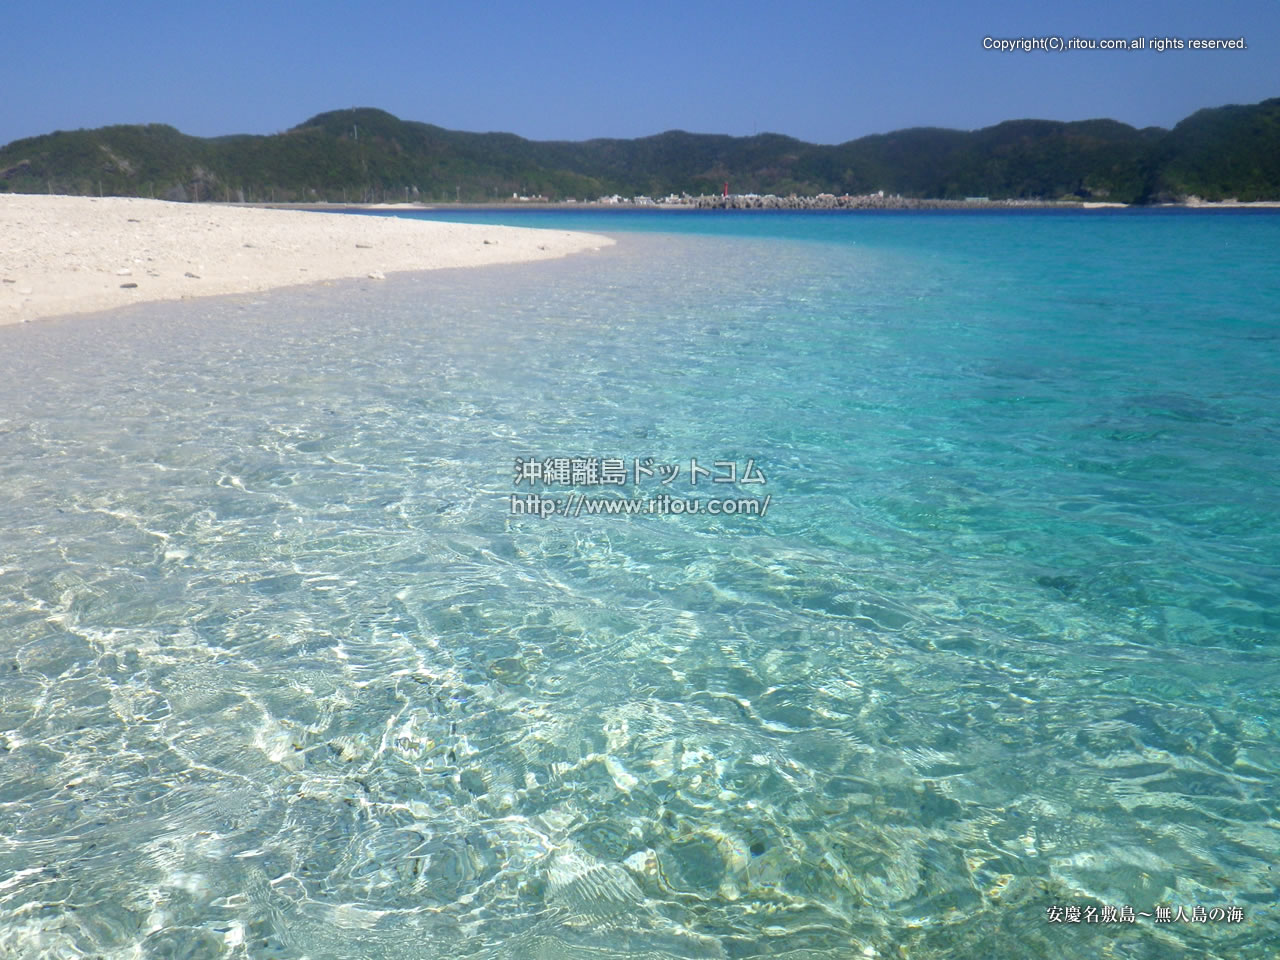 安慶名敷島〜無人島の海